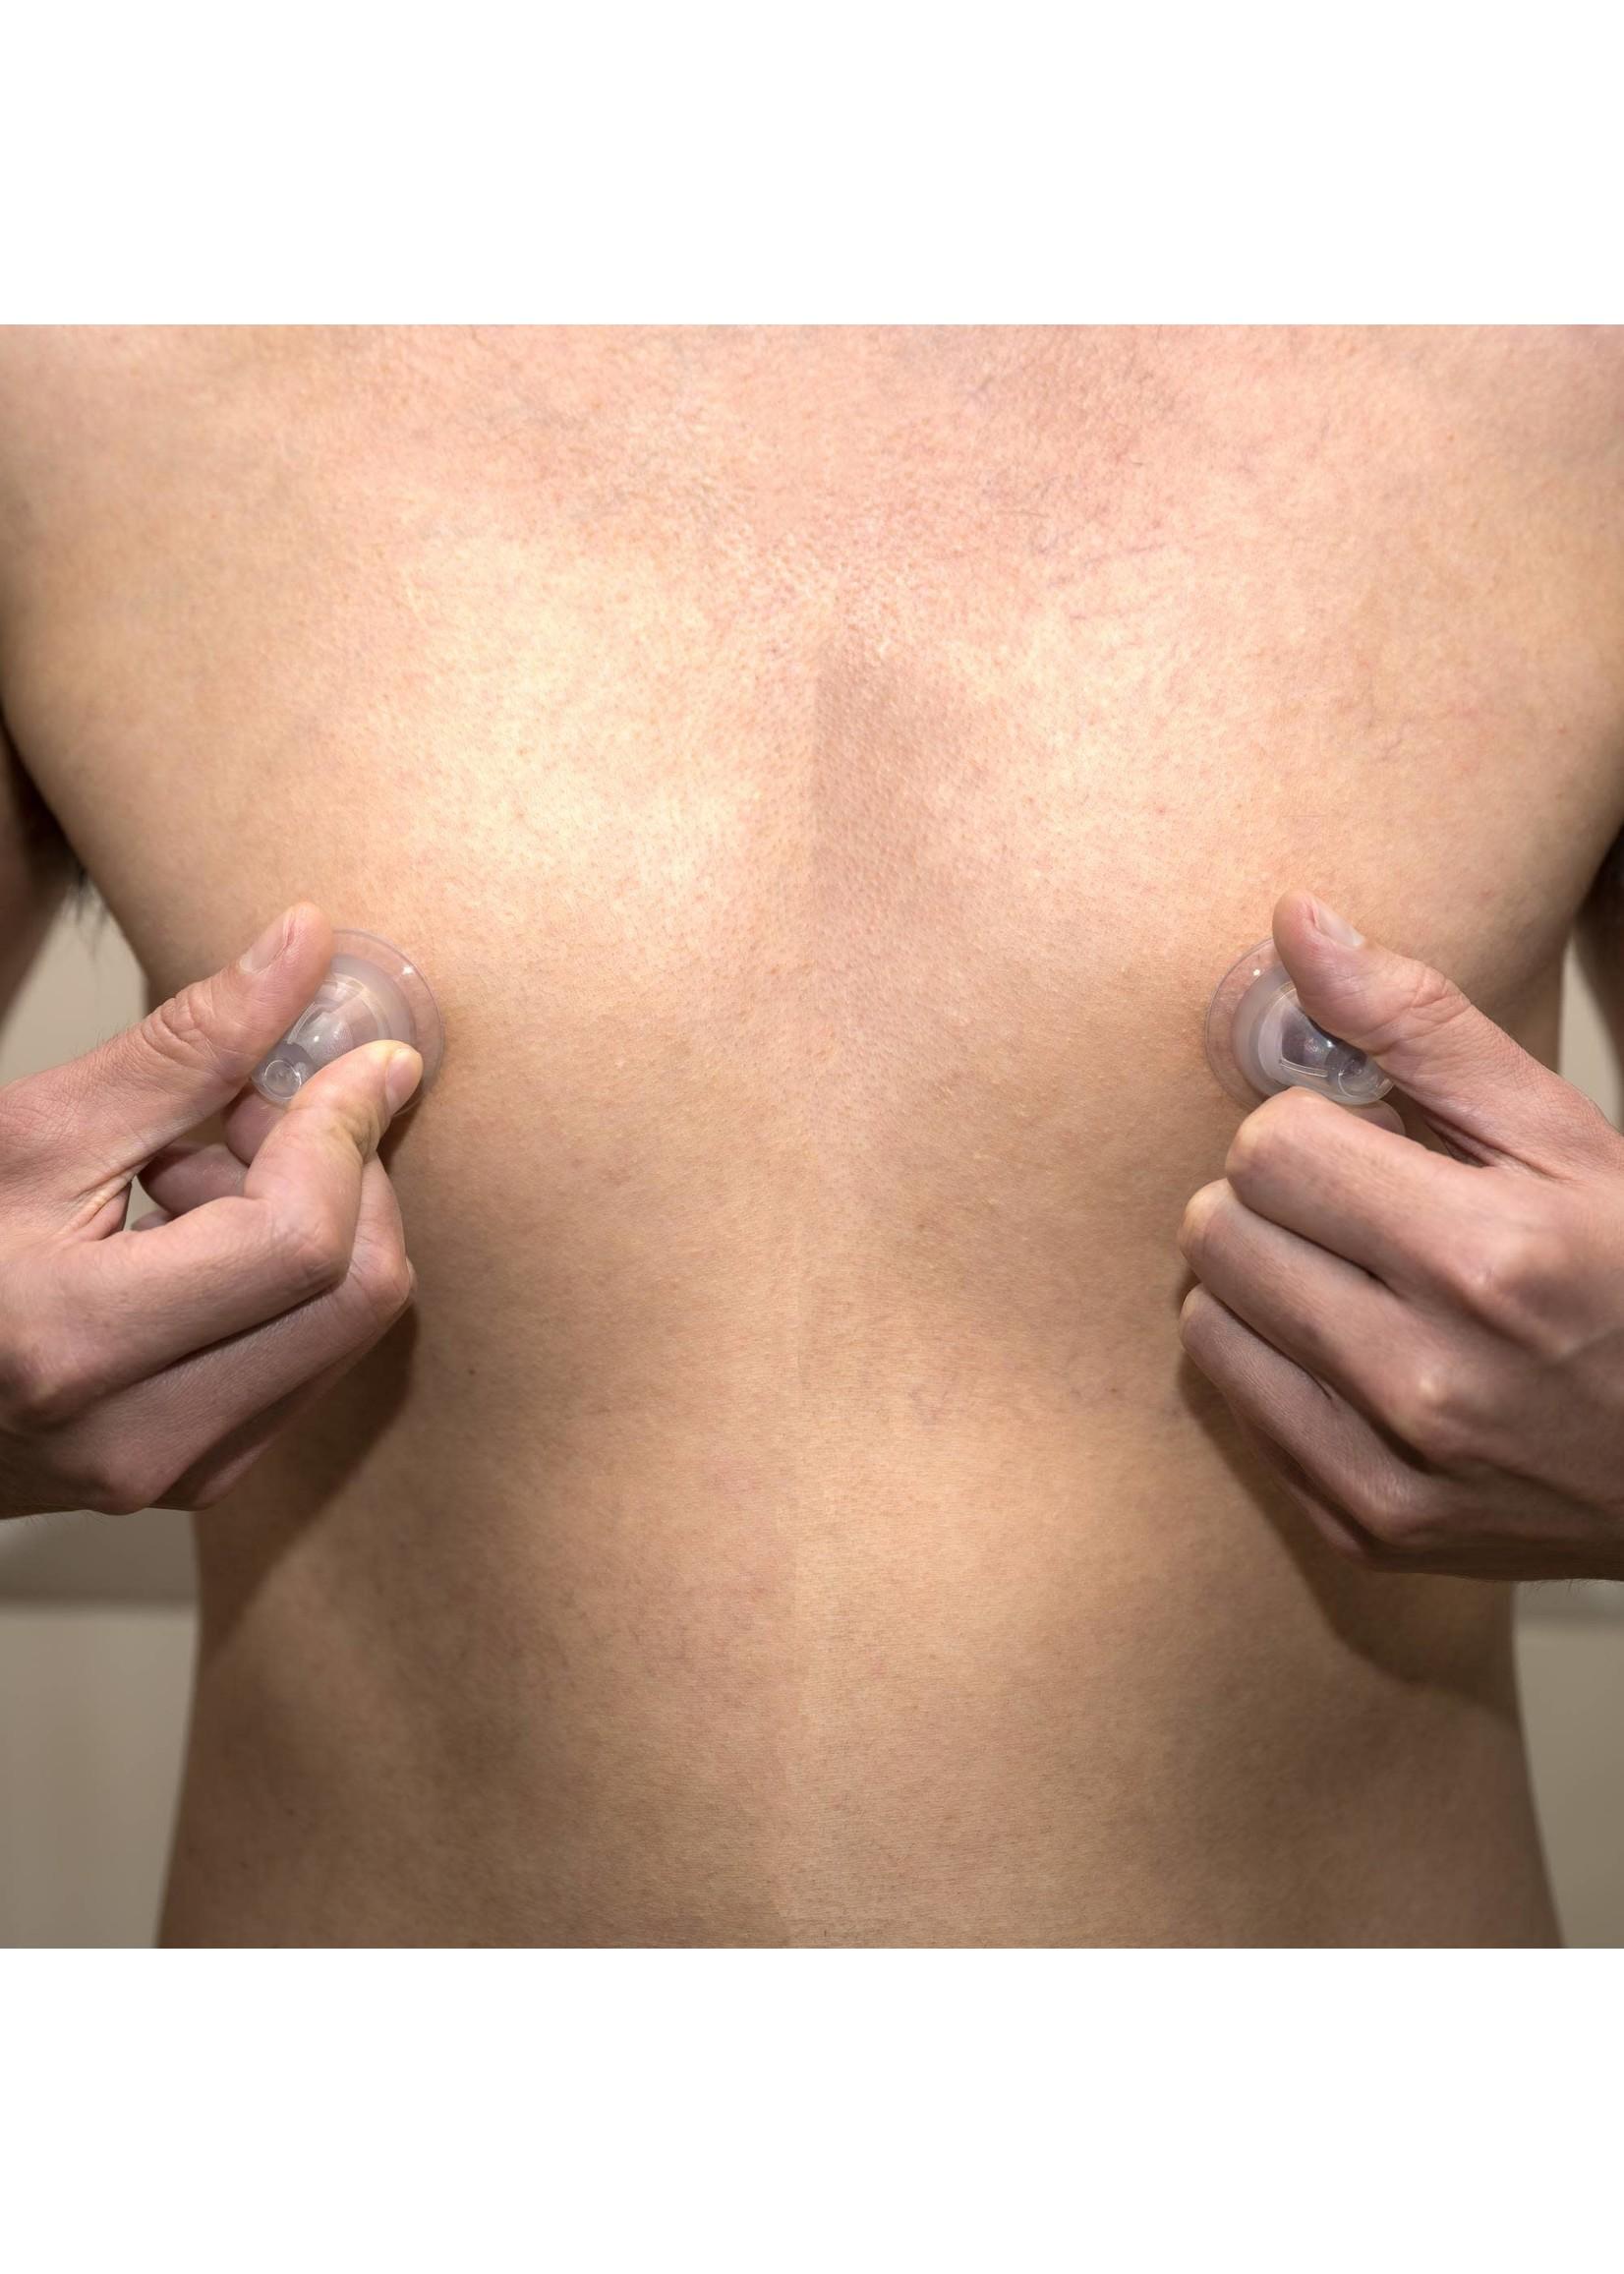 665 Leather 665 Super Silicone Nipple Suckers w/Travel Case